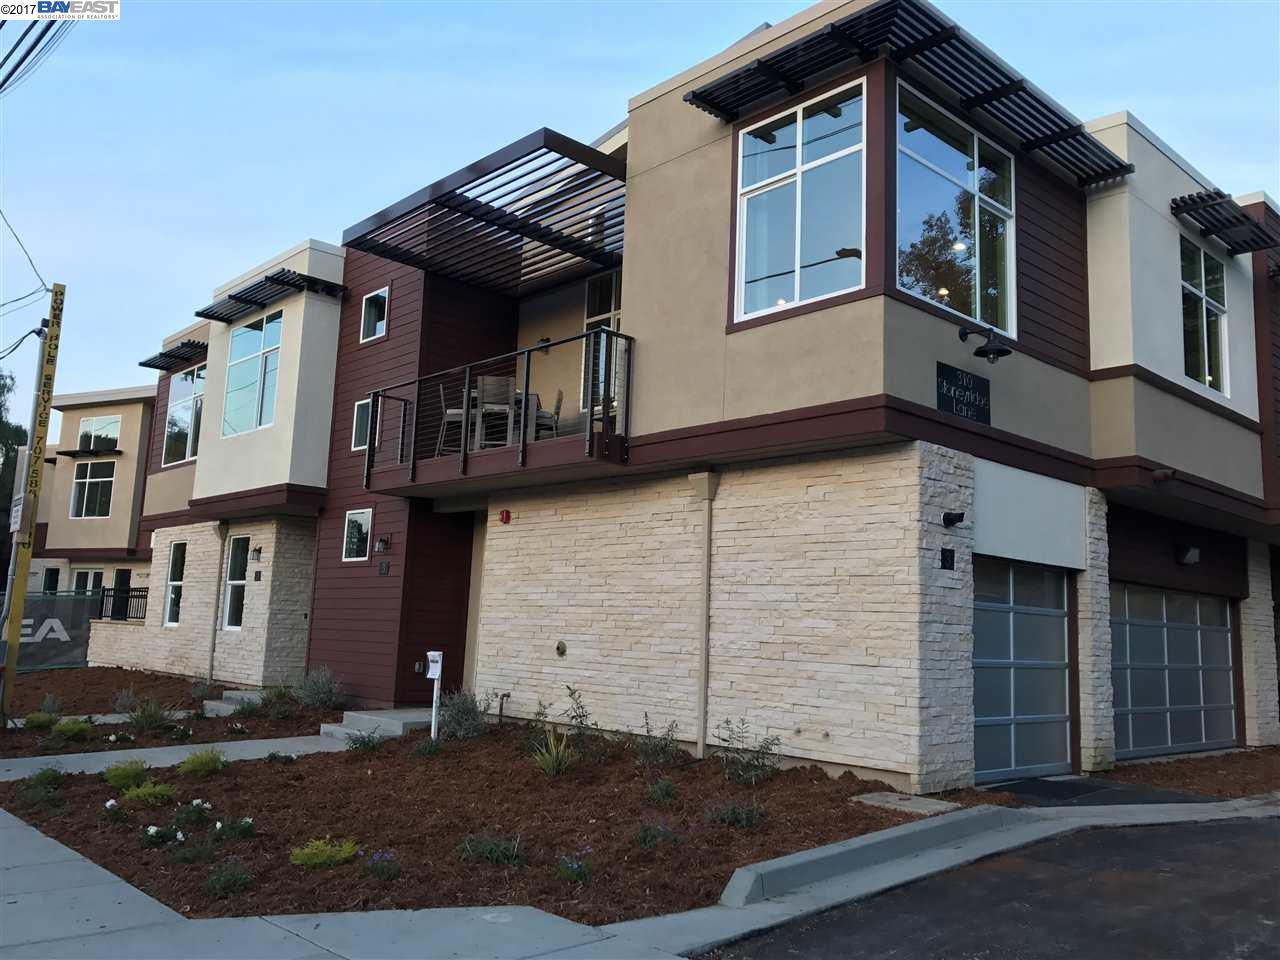 شقة بعمارة للـ Sale في 305 Stoneyridge Lane 305 Stoneyridge Lane Walnut Creek, California 94596 United States